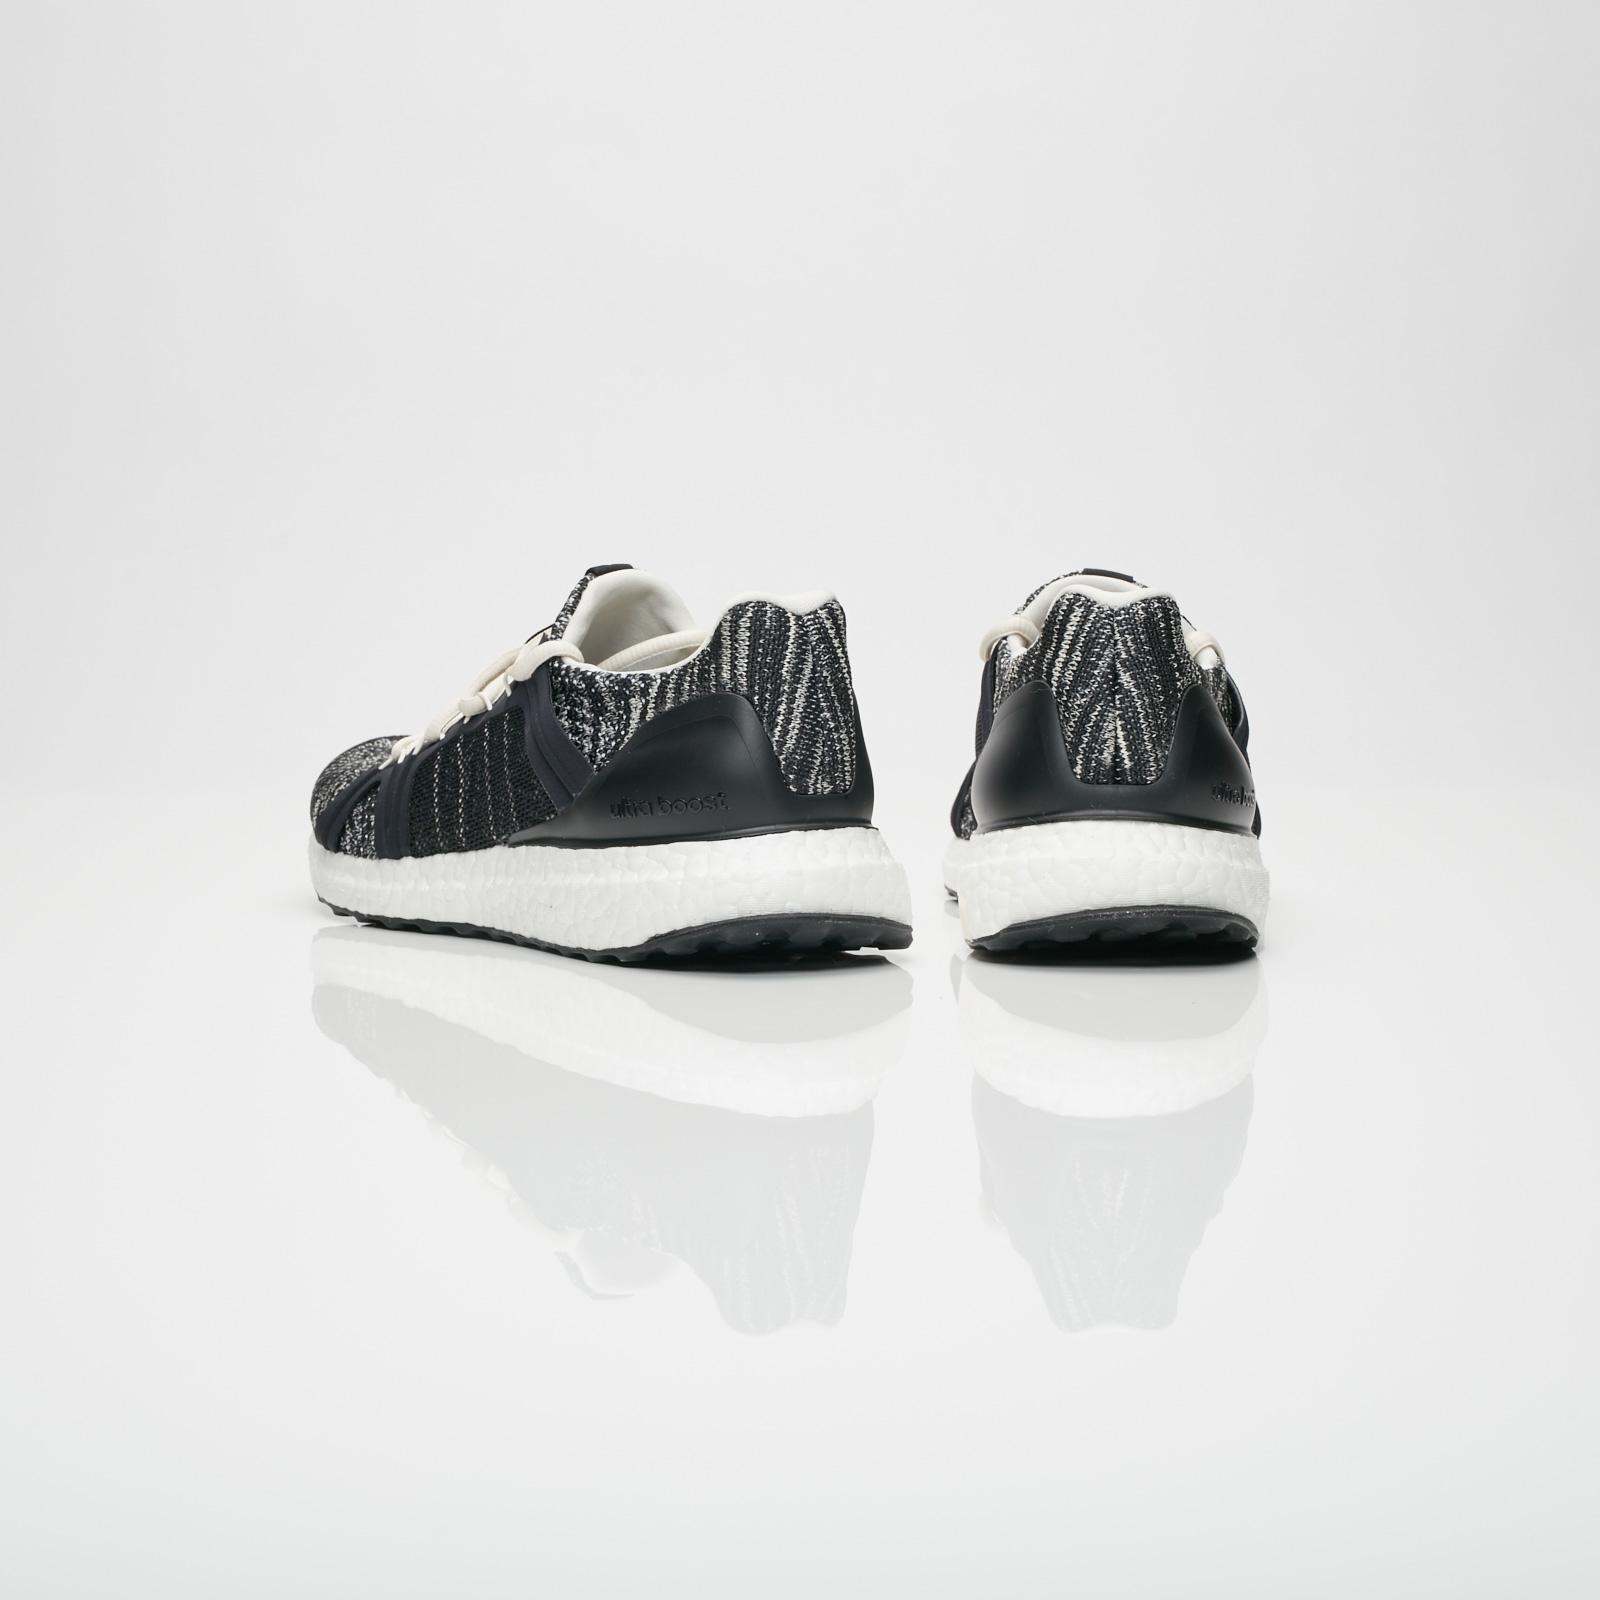 b9b43523c adidas UltraBOOST Parley - Bb6264 - Sneakersnstuff